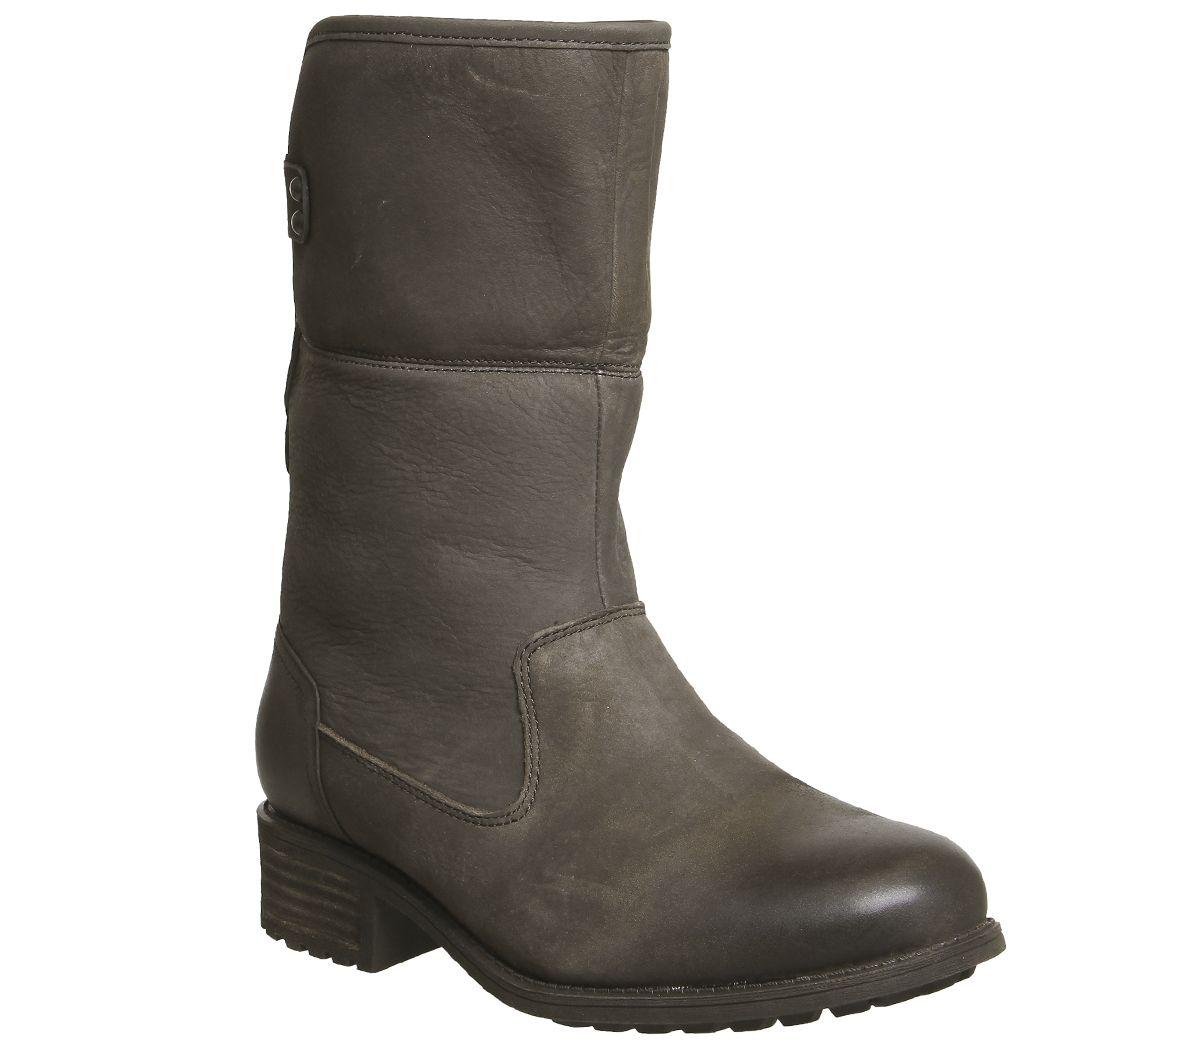 fb421083bf8 Aldon Fold Down Boots